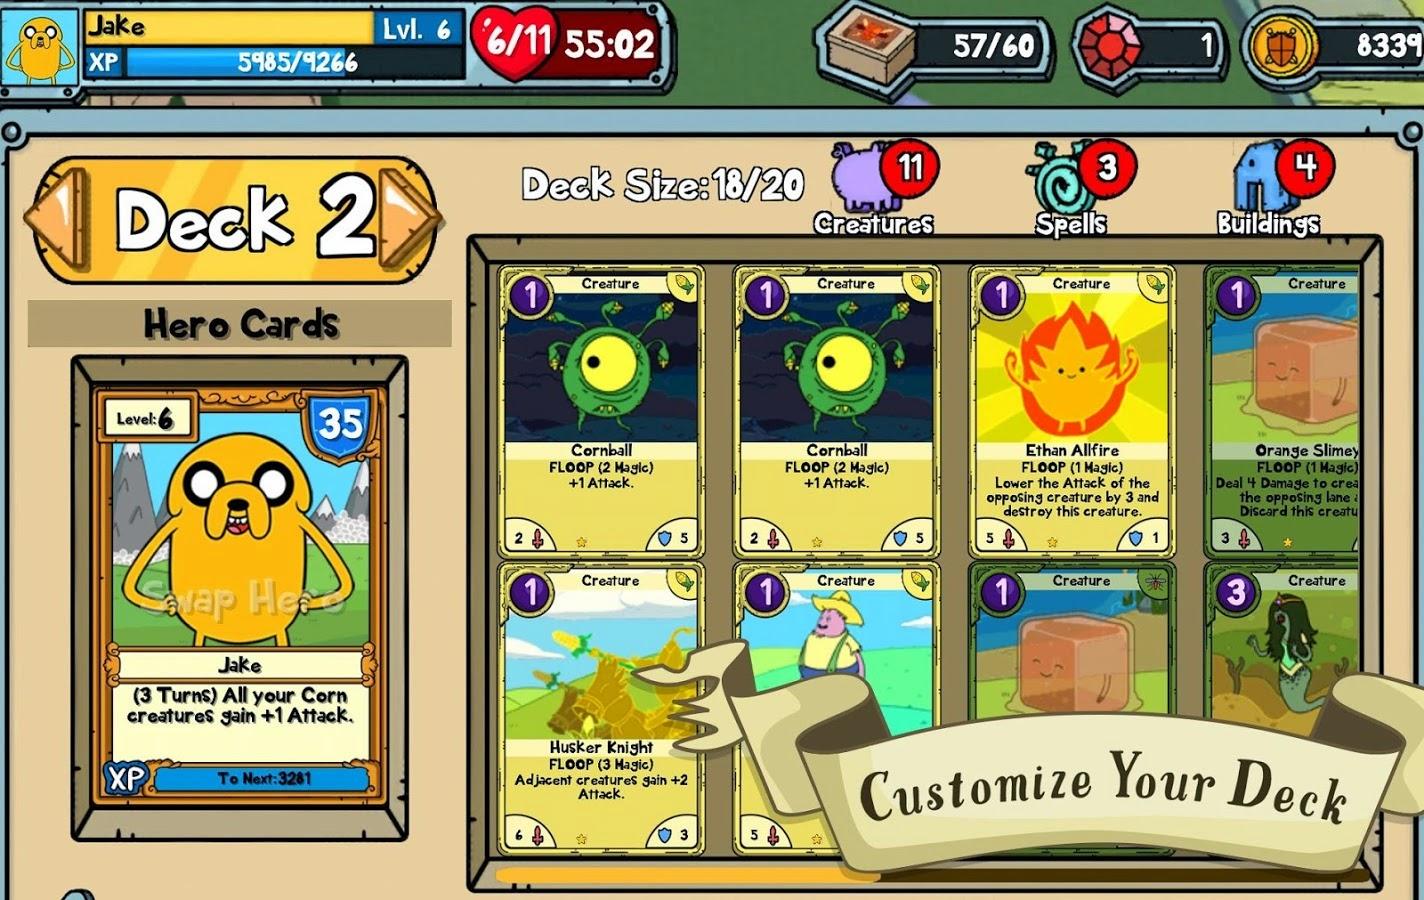 CardWarsAdventureTimeMODAPK%2BDATAv1.3.0_Androcut_1 Card Wars Adventure Time MOD APK+DATA v1.3.0 (1.3.0) (Mod Unlimited Coins) Apps